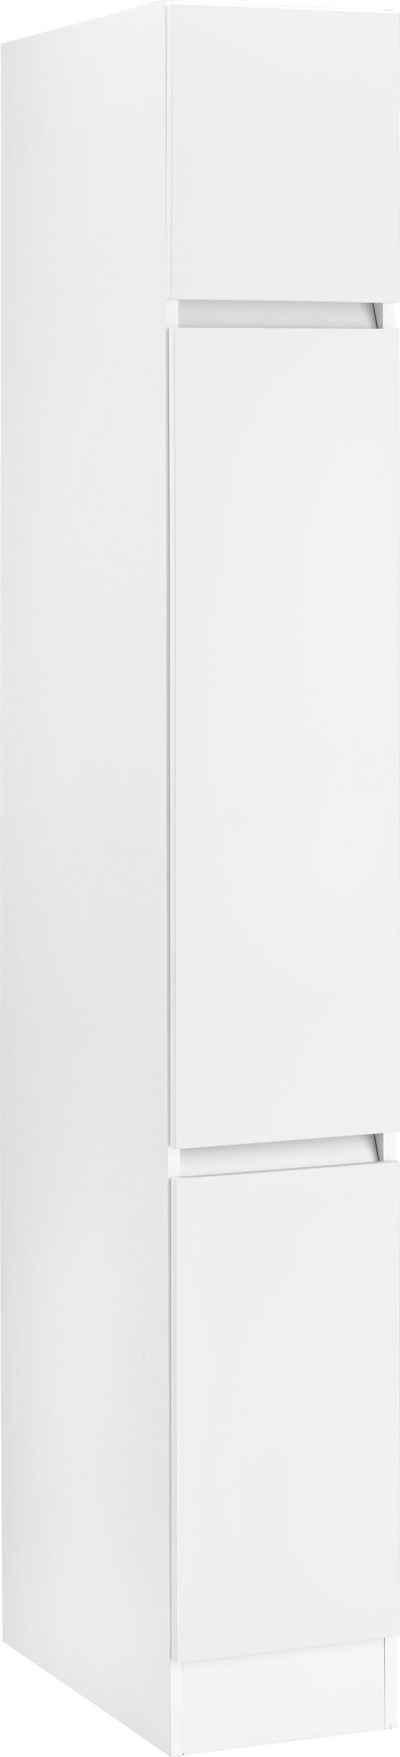 OPTIFIT Apothekerschrank »Roth« Breite 30 cm